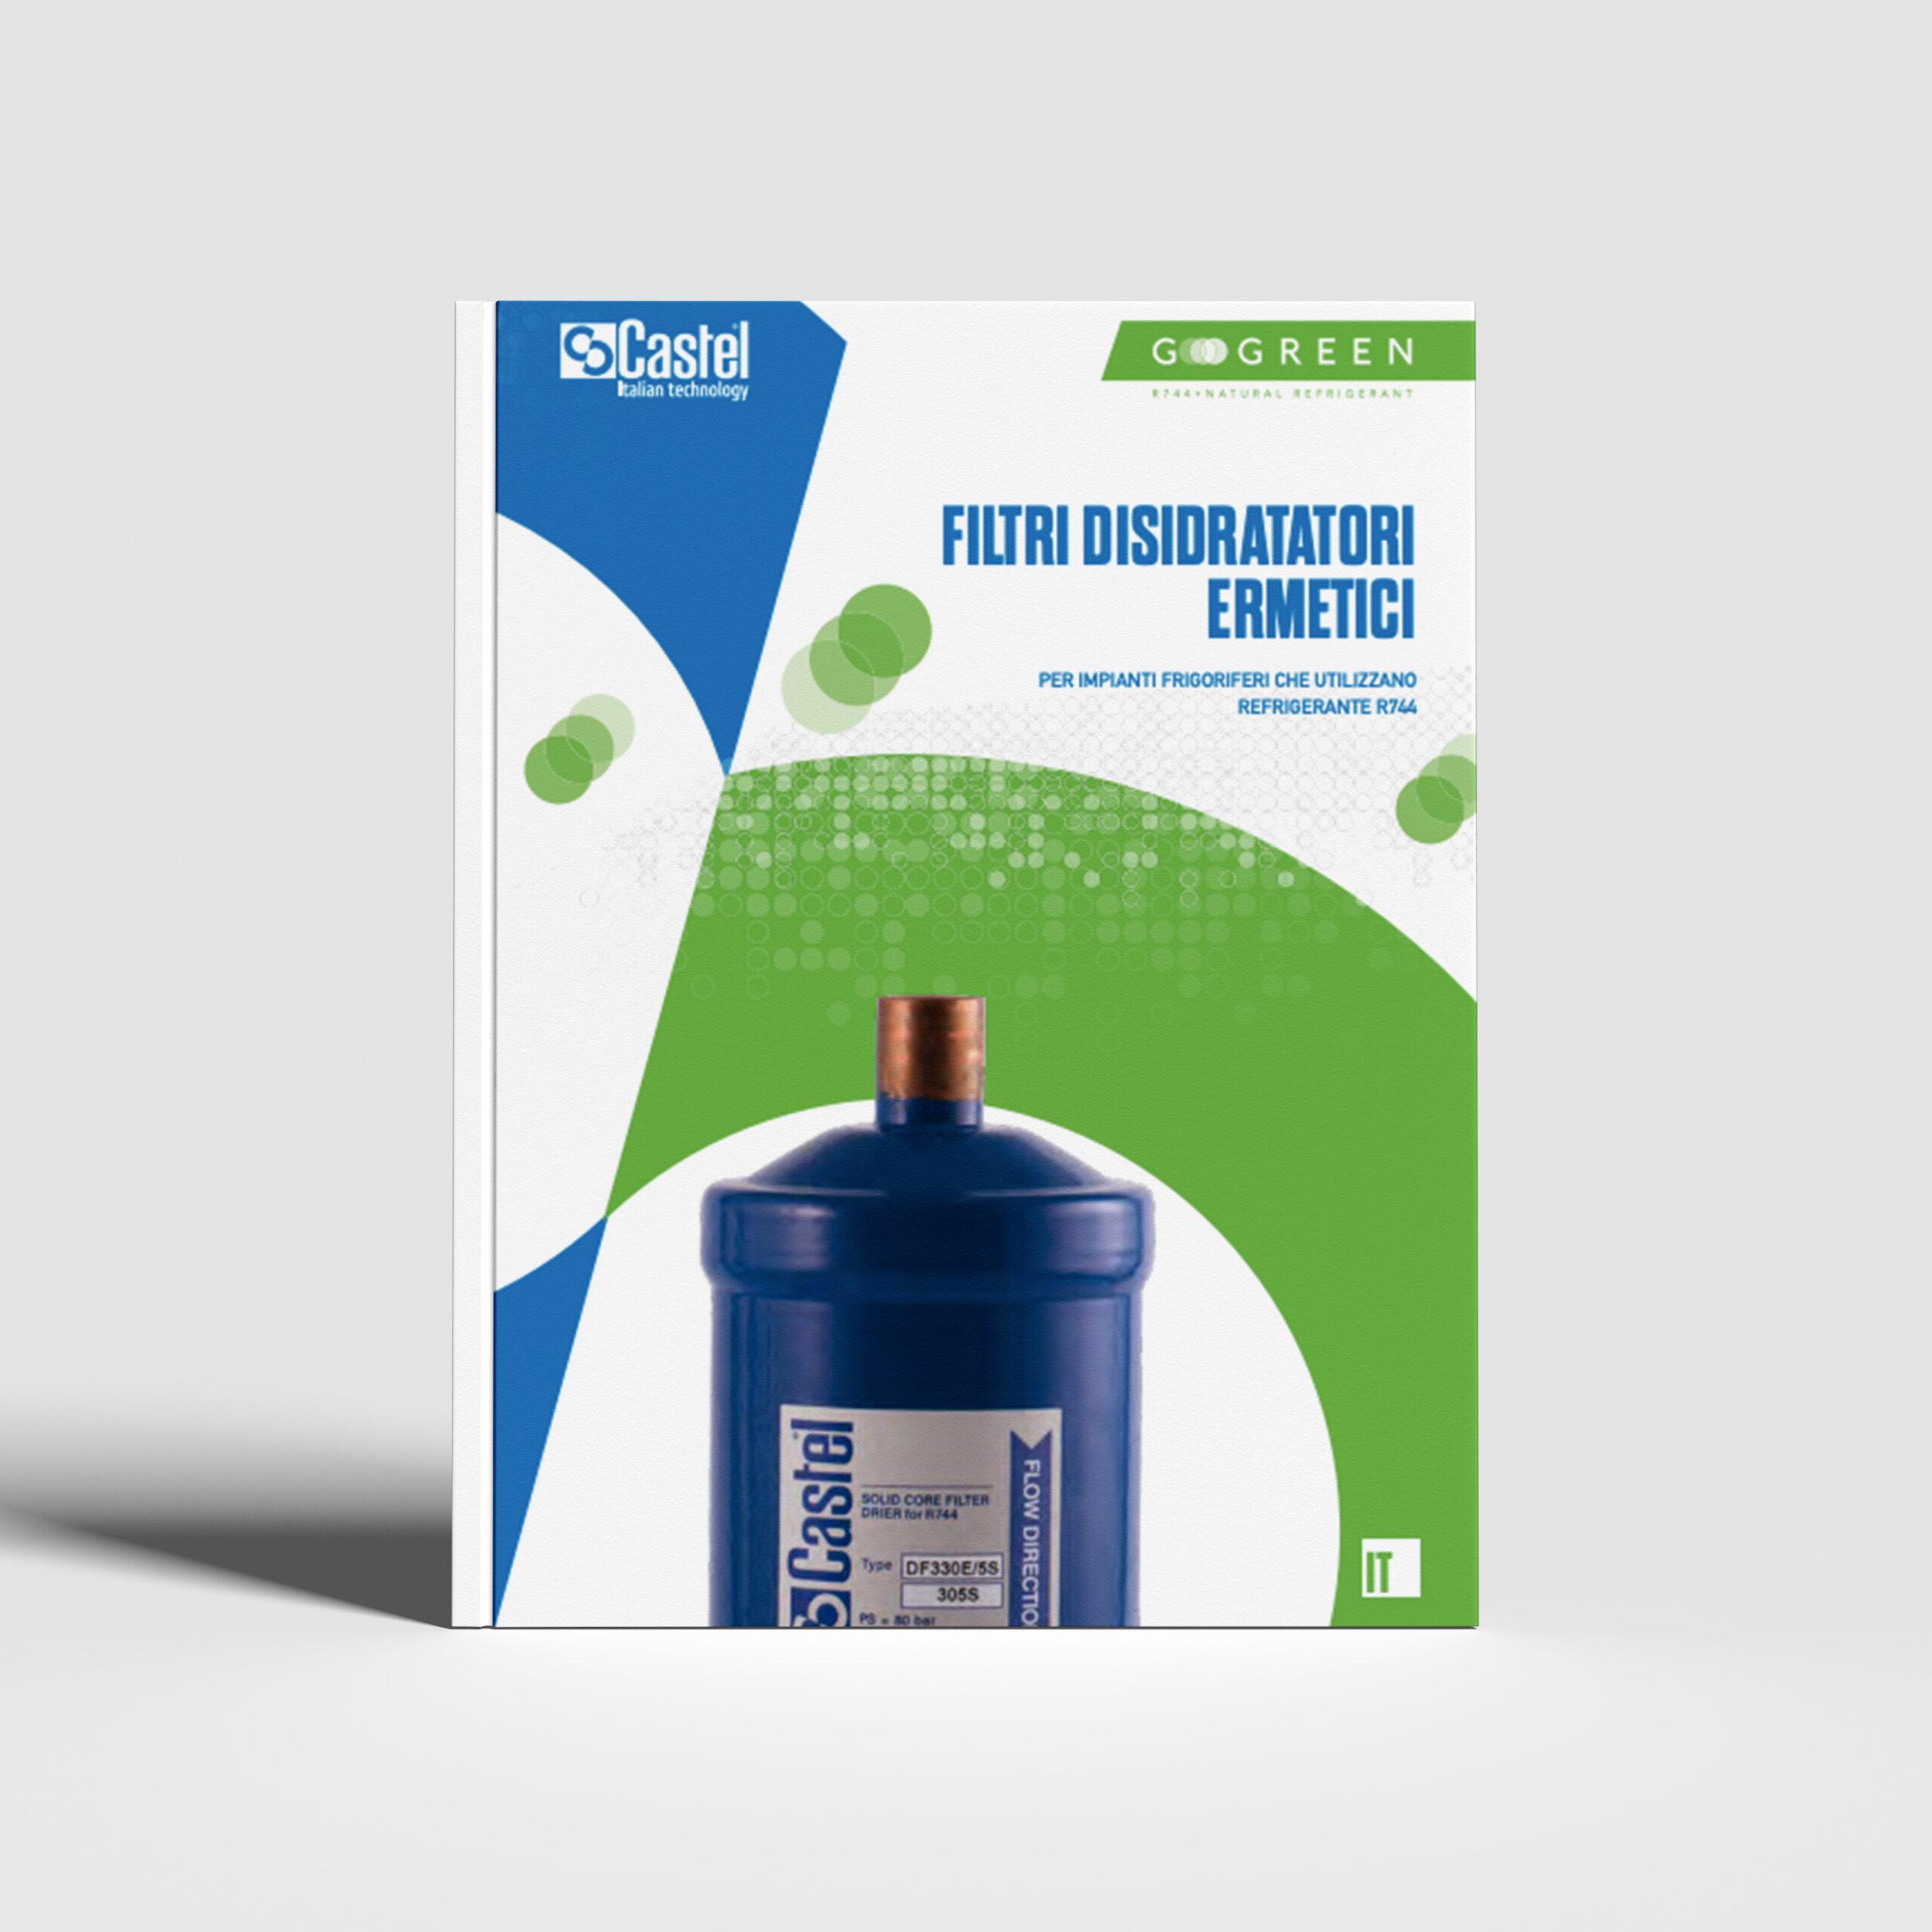 Filtri disidratatori ermetici per CO2